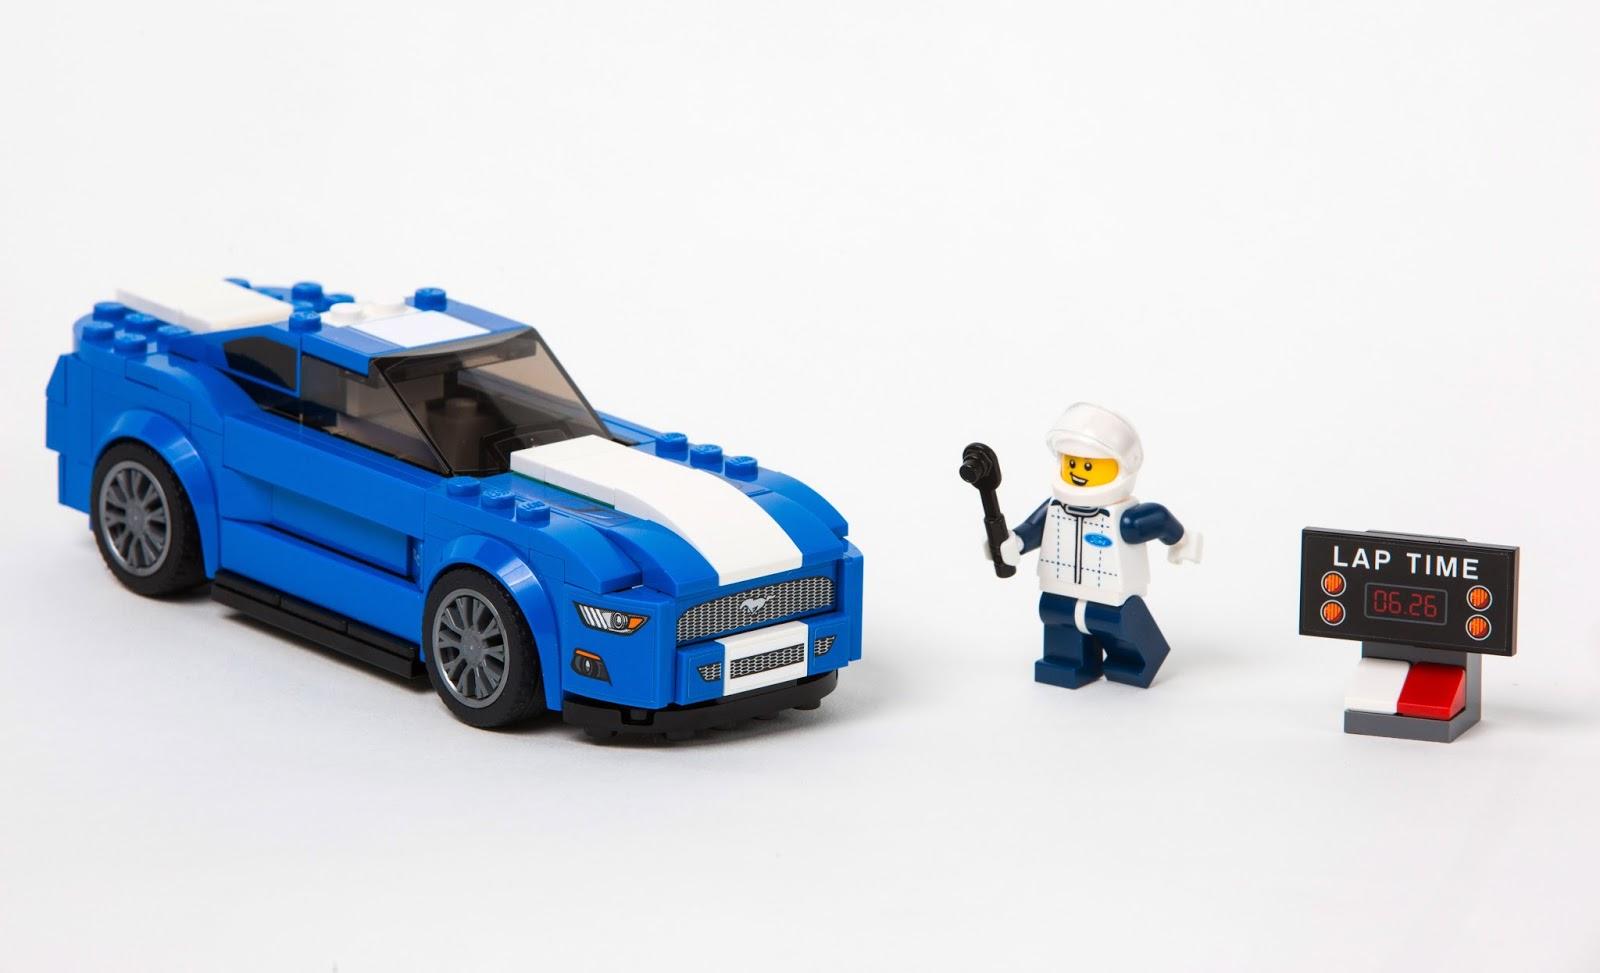 LEGOMustangSet Νέα LEGO Ford Mustang και F-150 Raptor και τα Παιδικά Όνειρα Γίνονται Πραγματικότητα